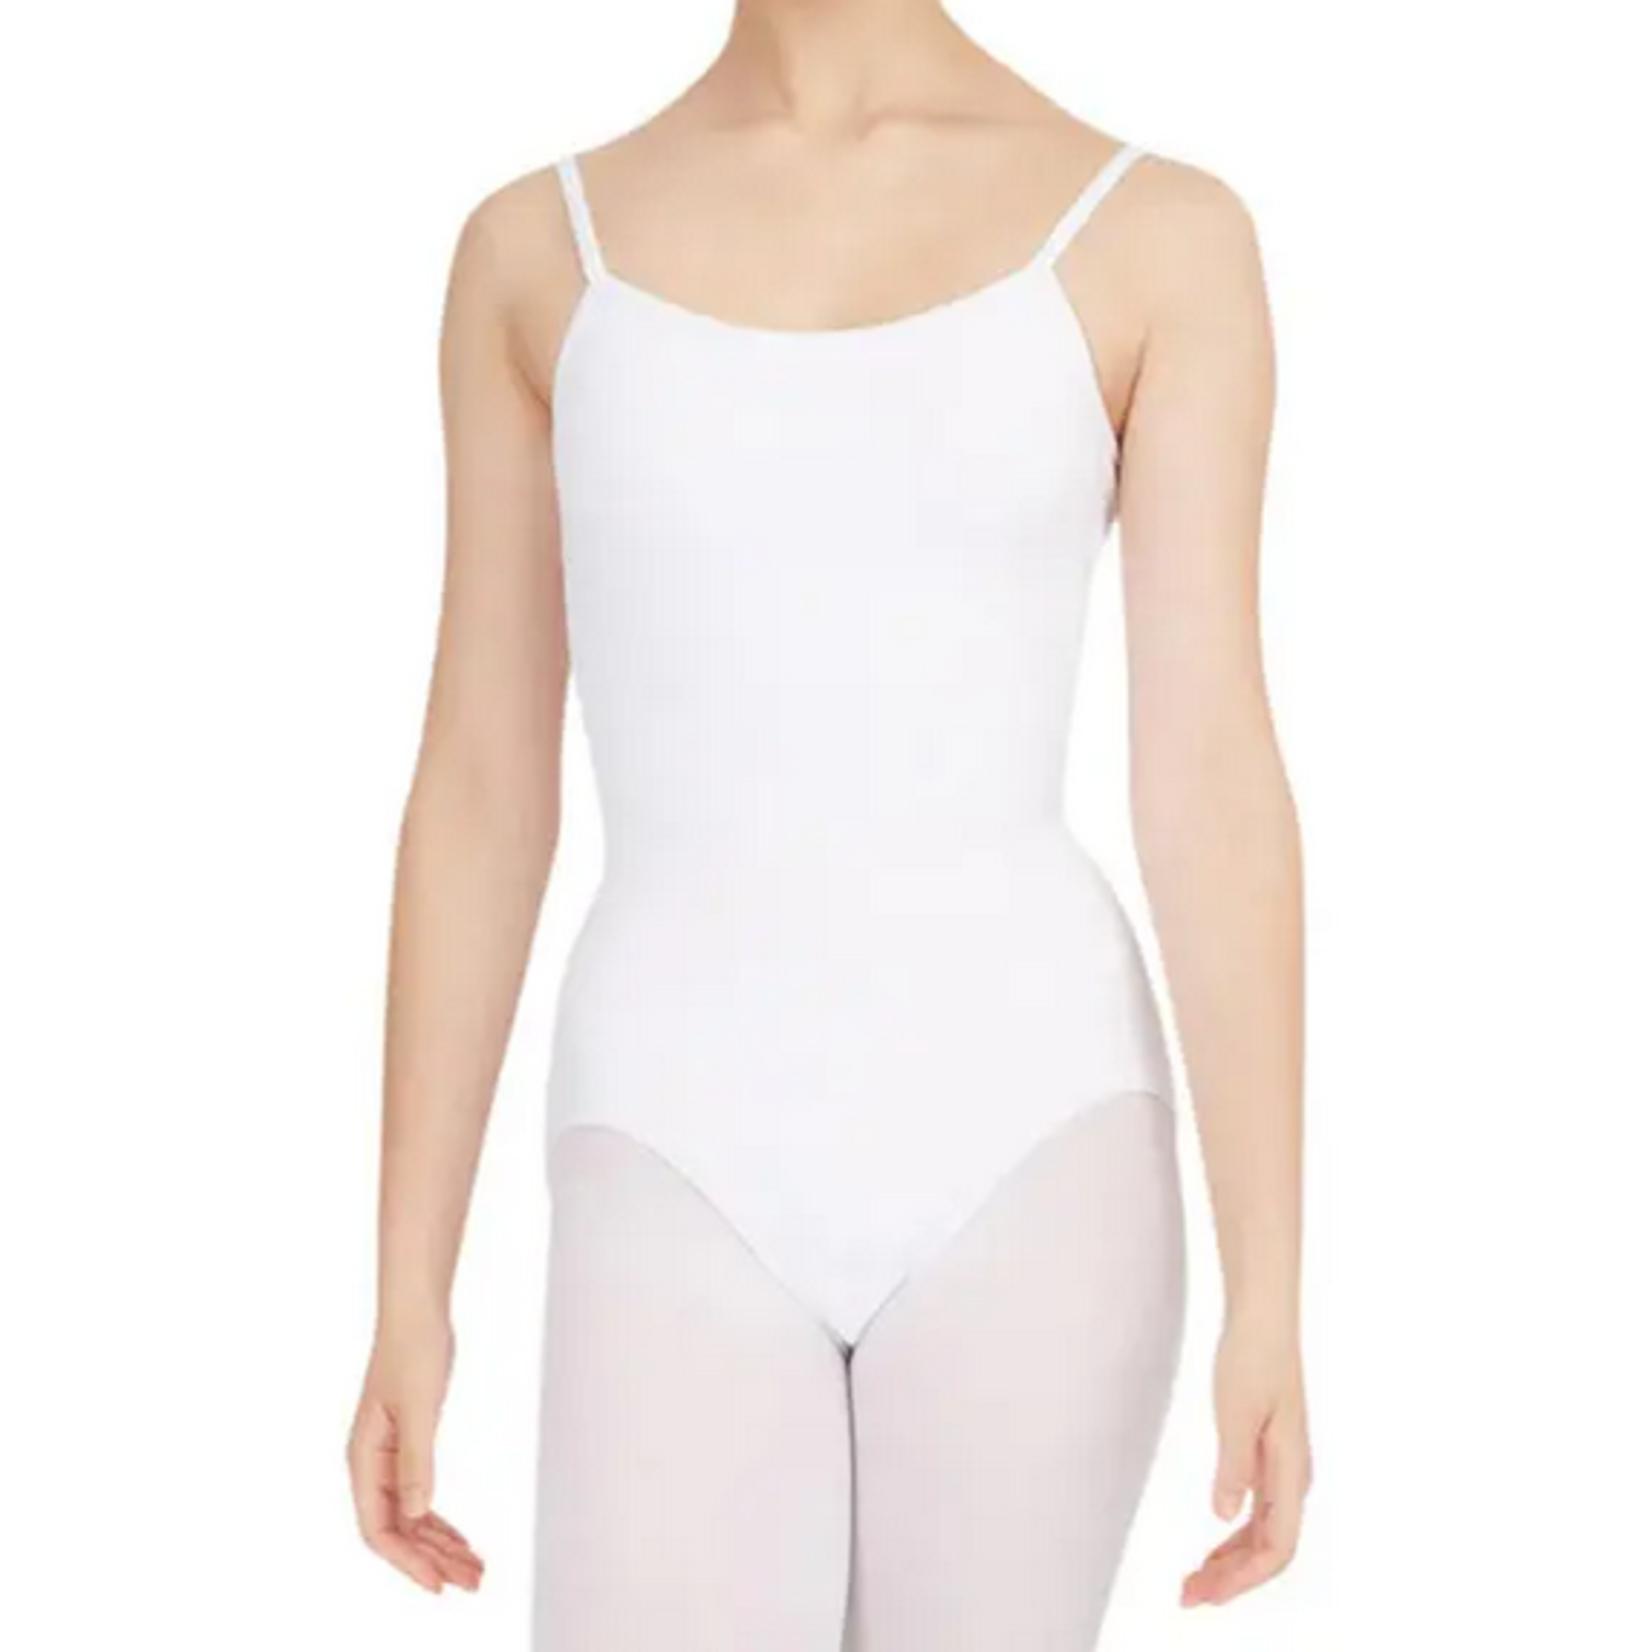 Capezio Capezio CC100 Cotton Adjustable Camisole Leotard